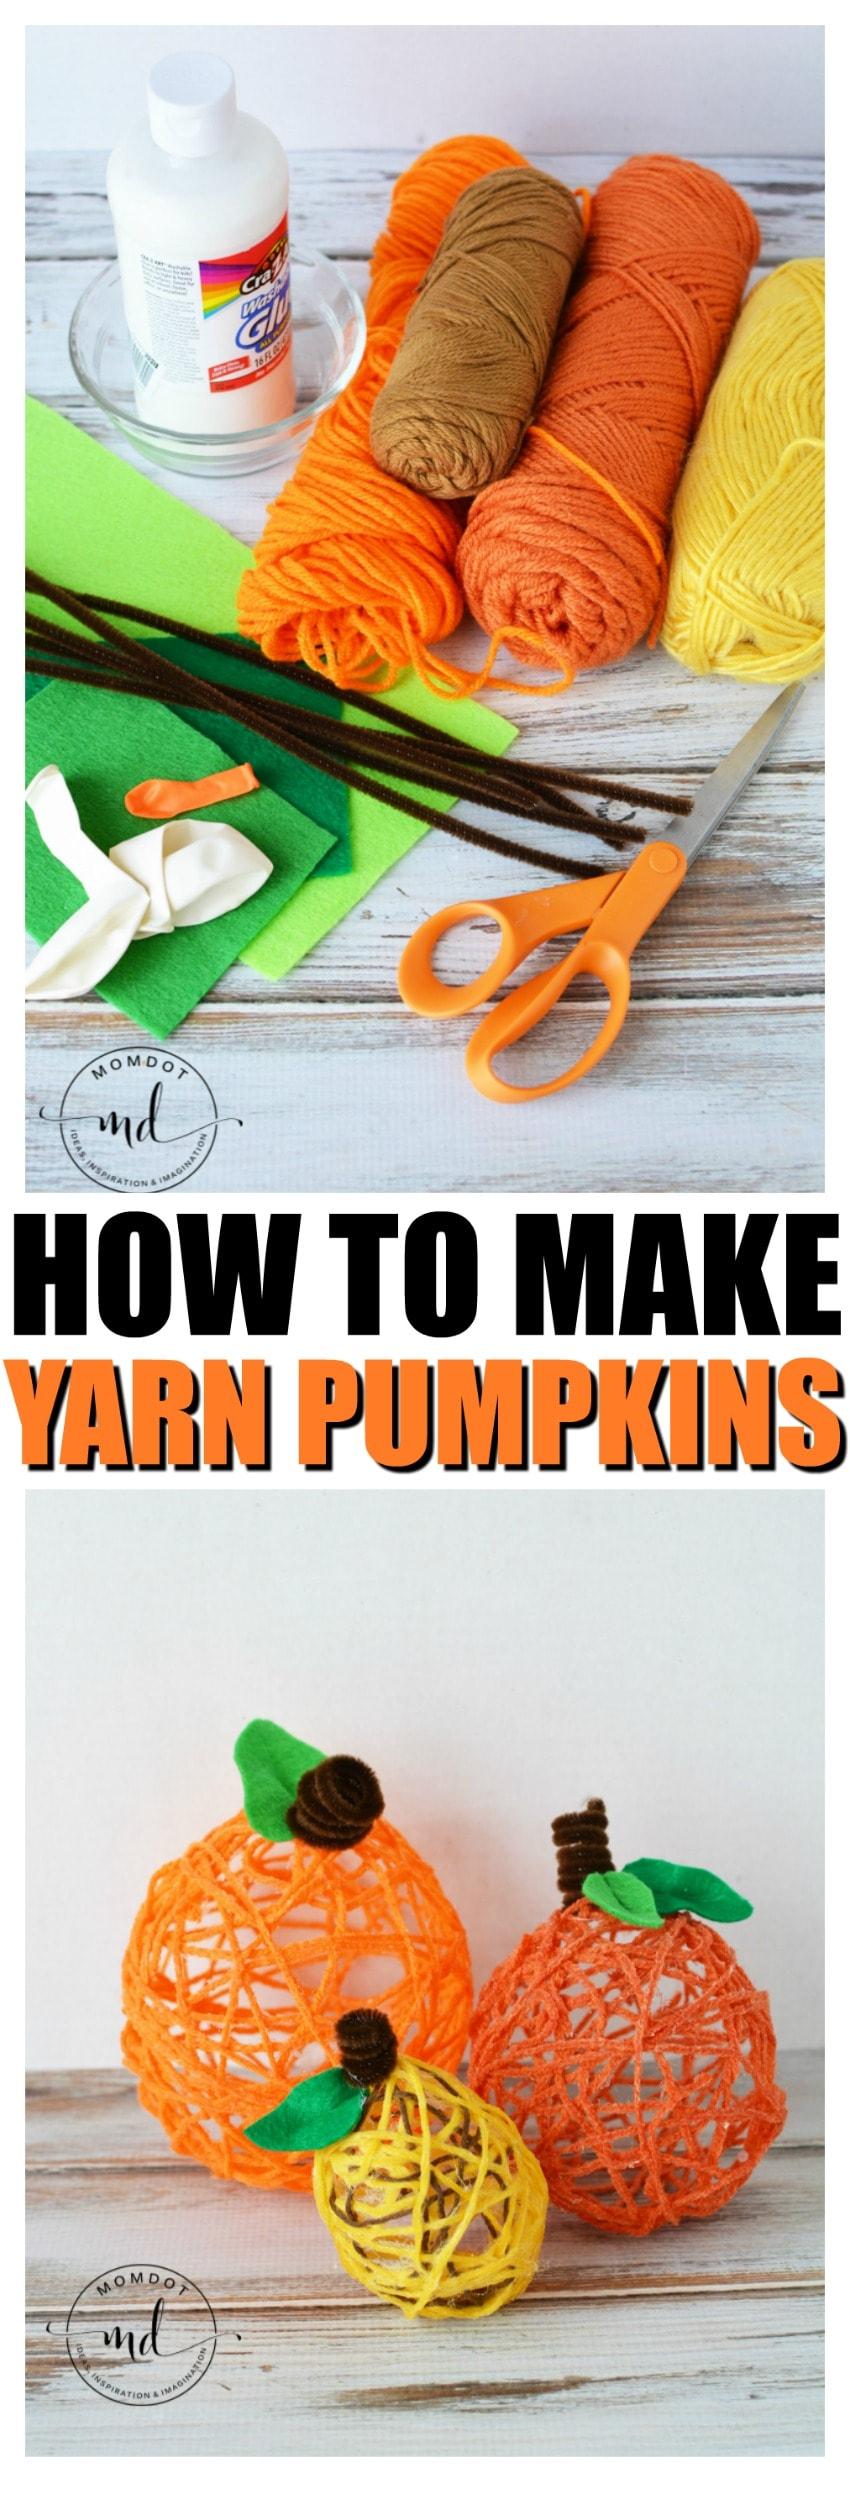 how to make yarn pumpkins Yarn Pumpkins | How to make Yarn Pumpkins | Simple Balloon Pumpkins for Halloween Crafting